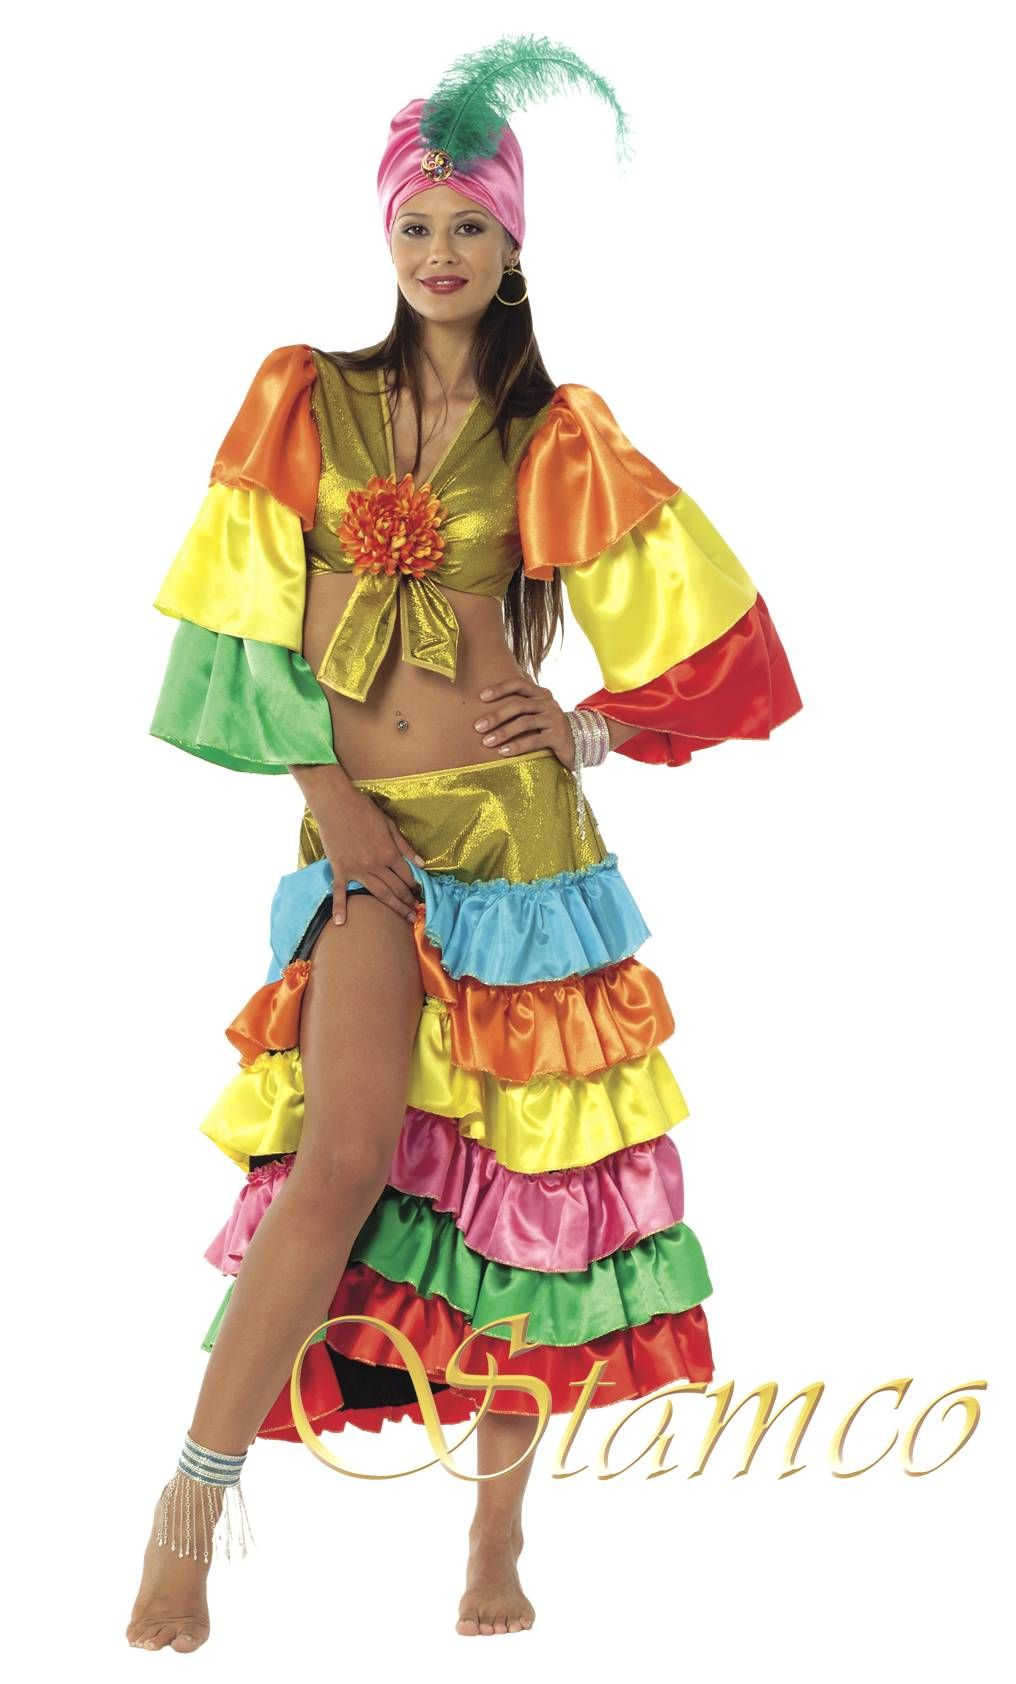 Costume brésilienne femme costumes Halloween costumes